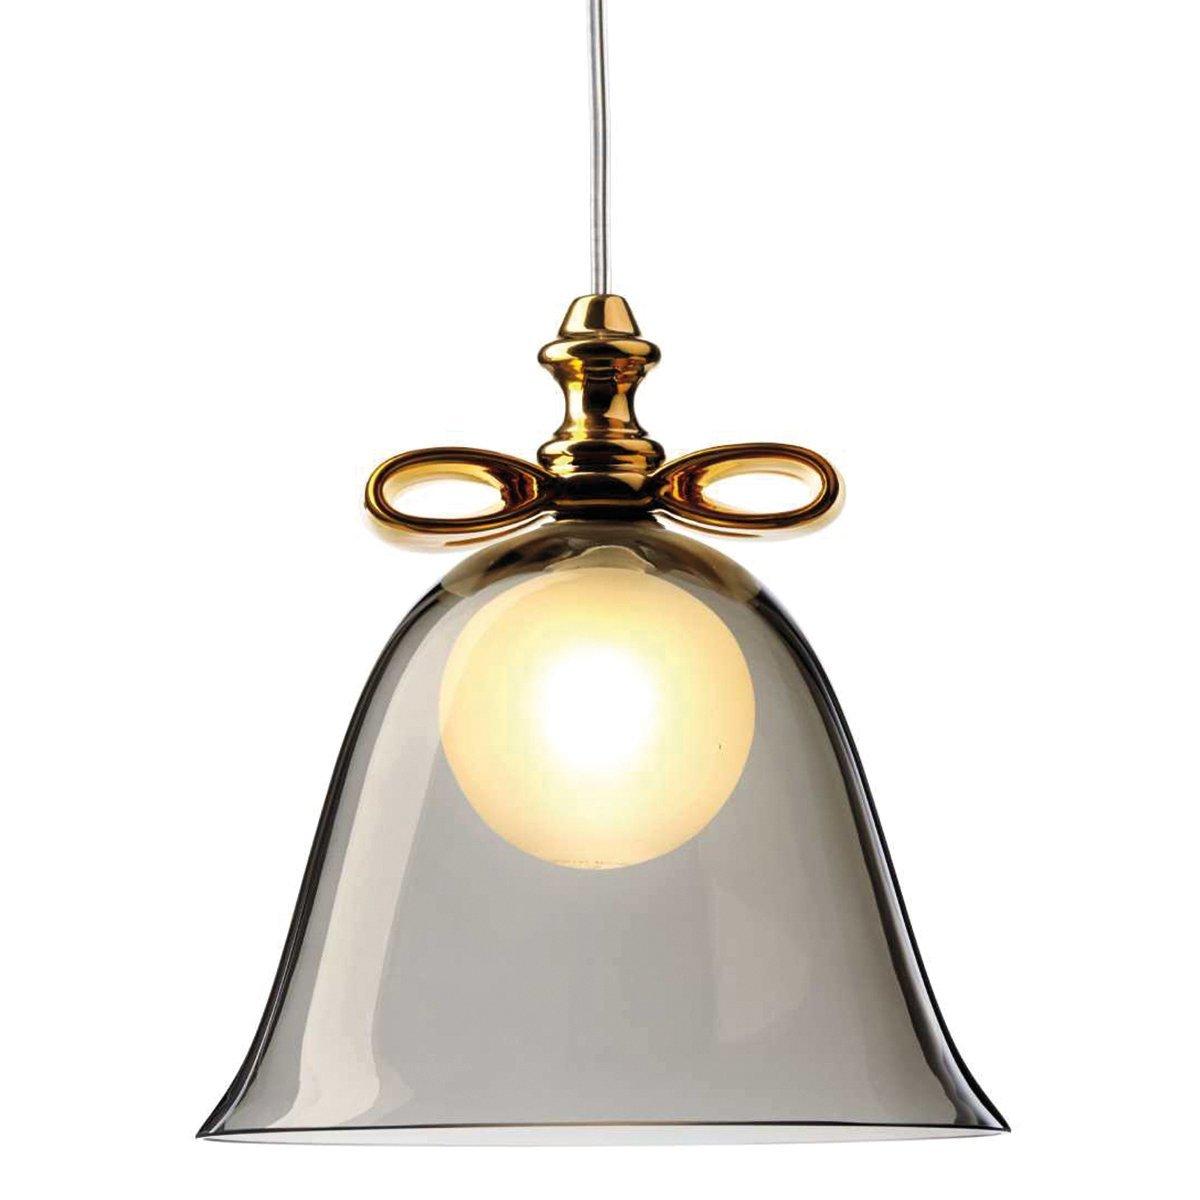 Moooi Bell Hanglamp - Smoke/Goud